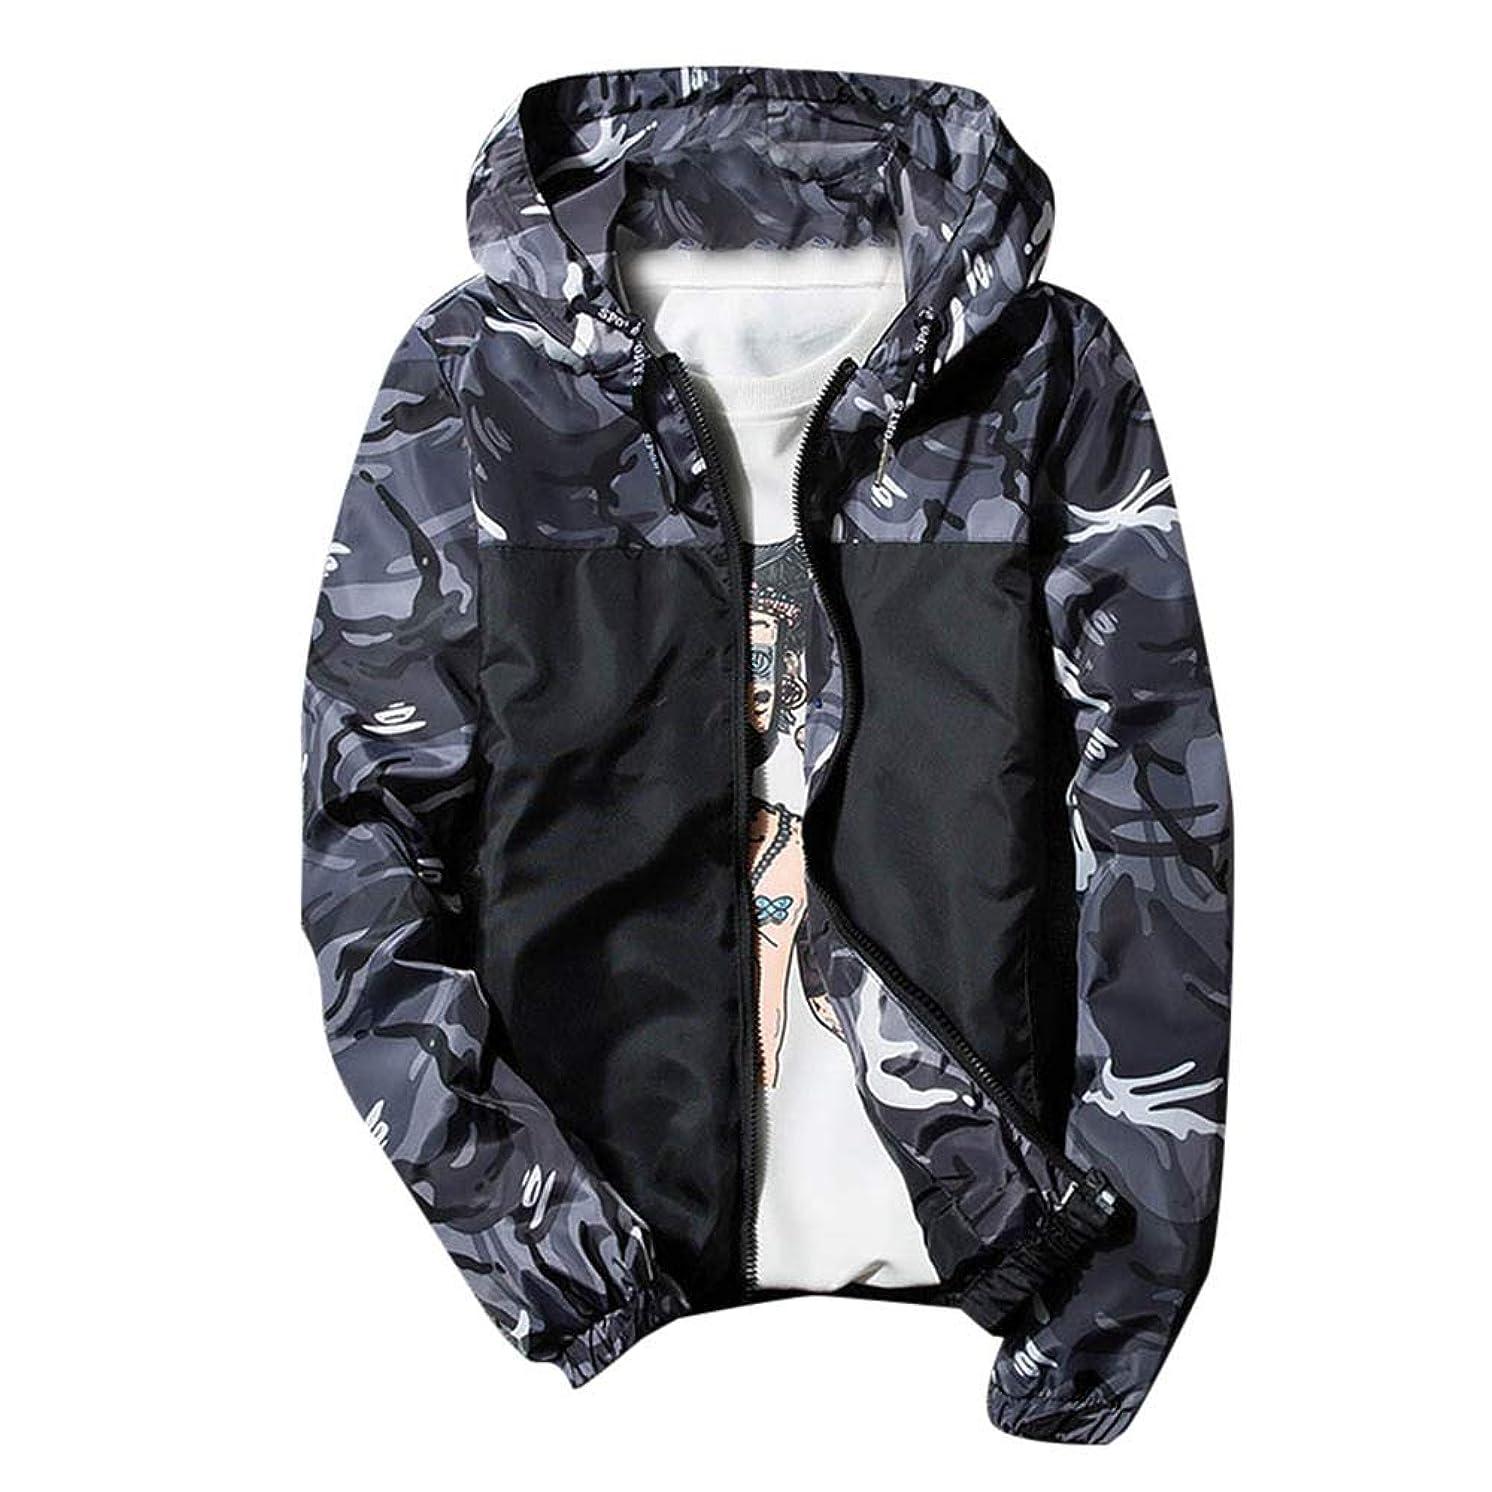 YOcheerful Mens Windbreaker Coat Men's Track Jacket Winter Hoodie Waterproof Windproof Outdoor Coat Jacket Outerwear